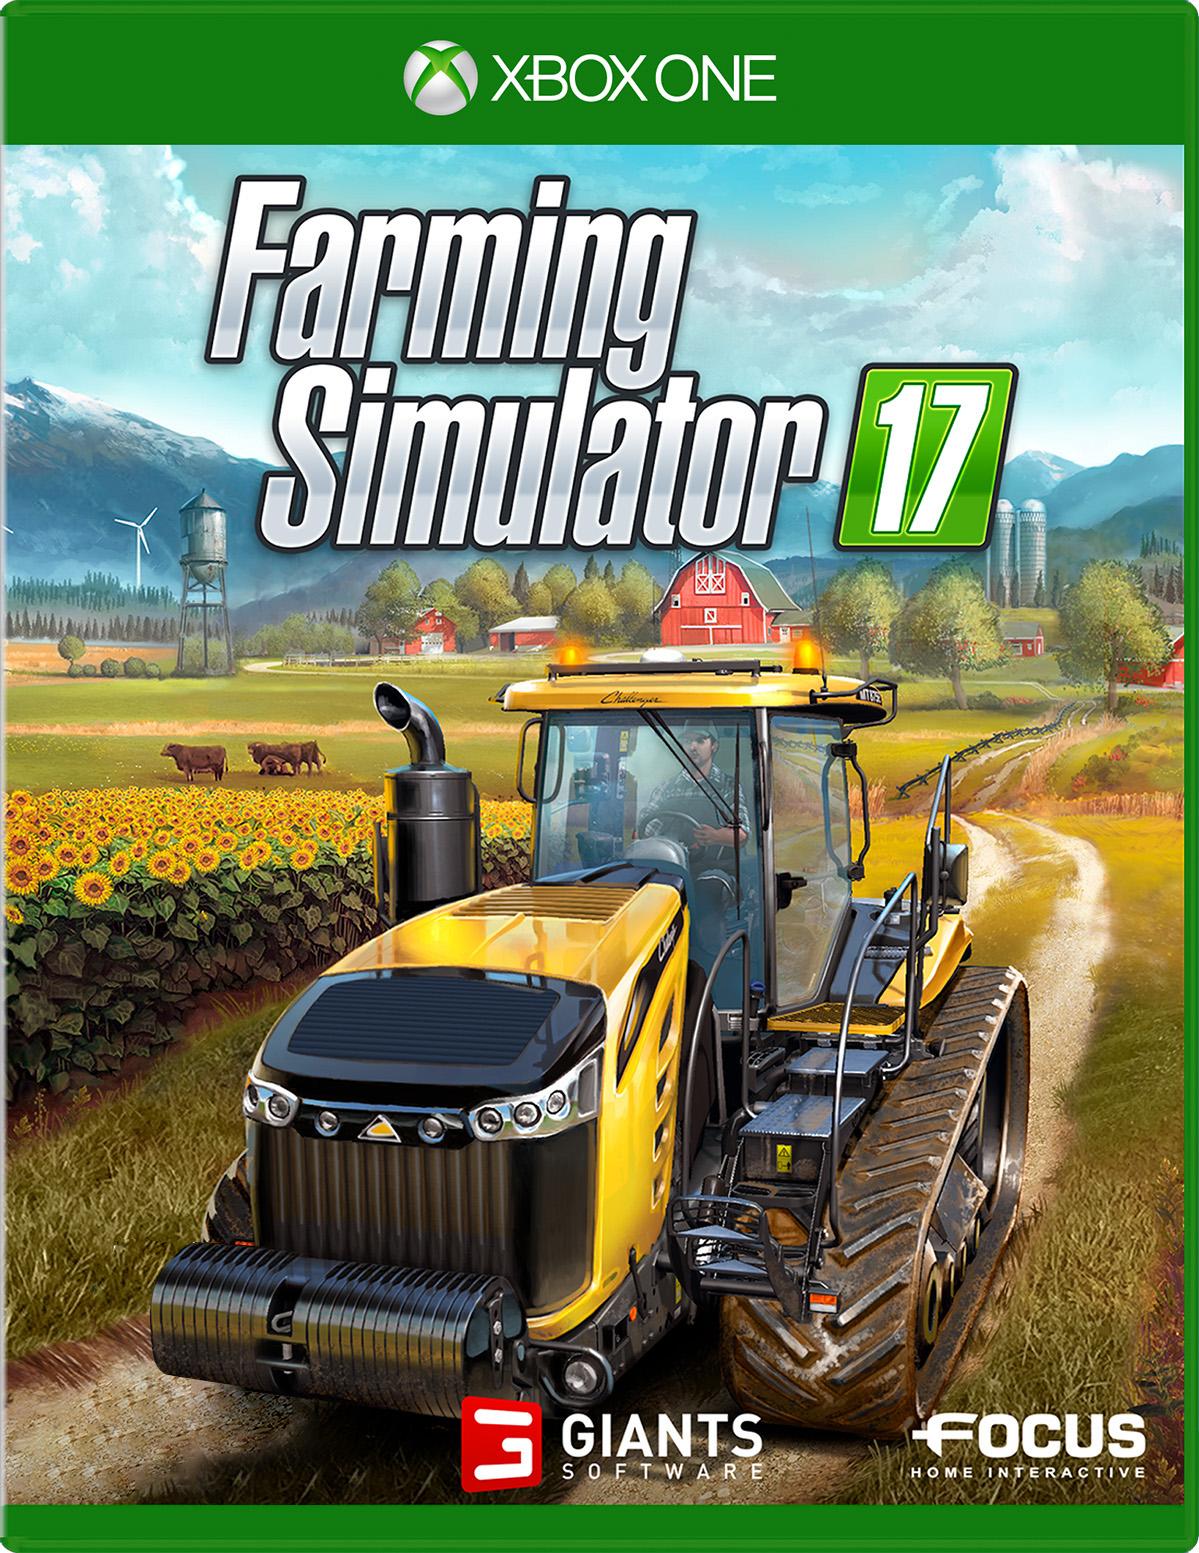 FarmingSimulator17 pour XboxOne